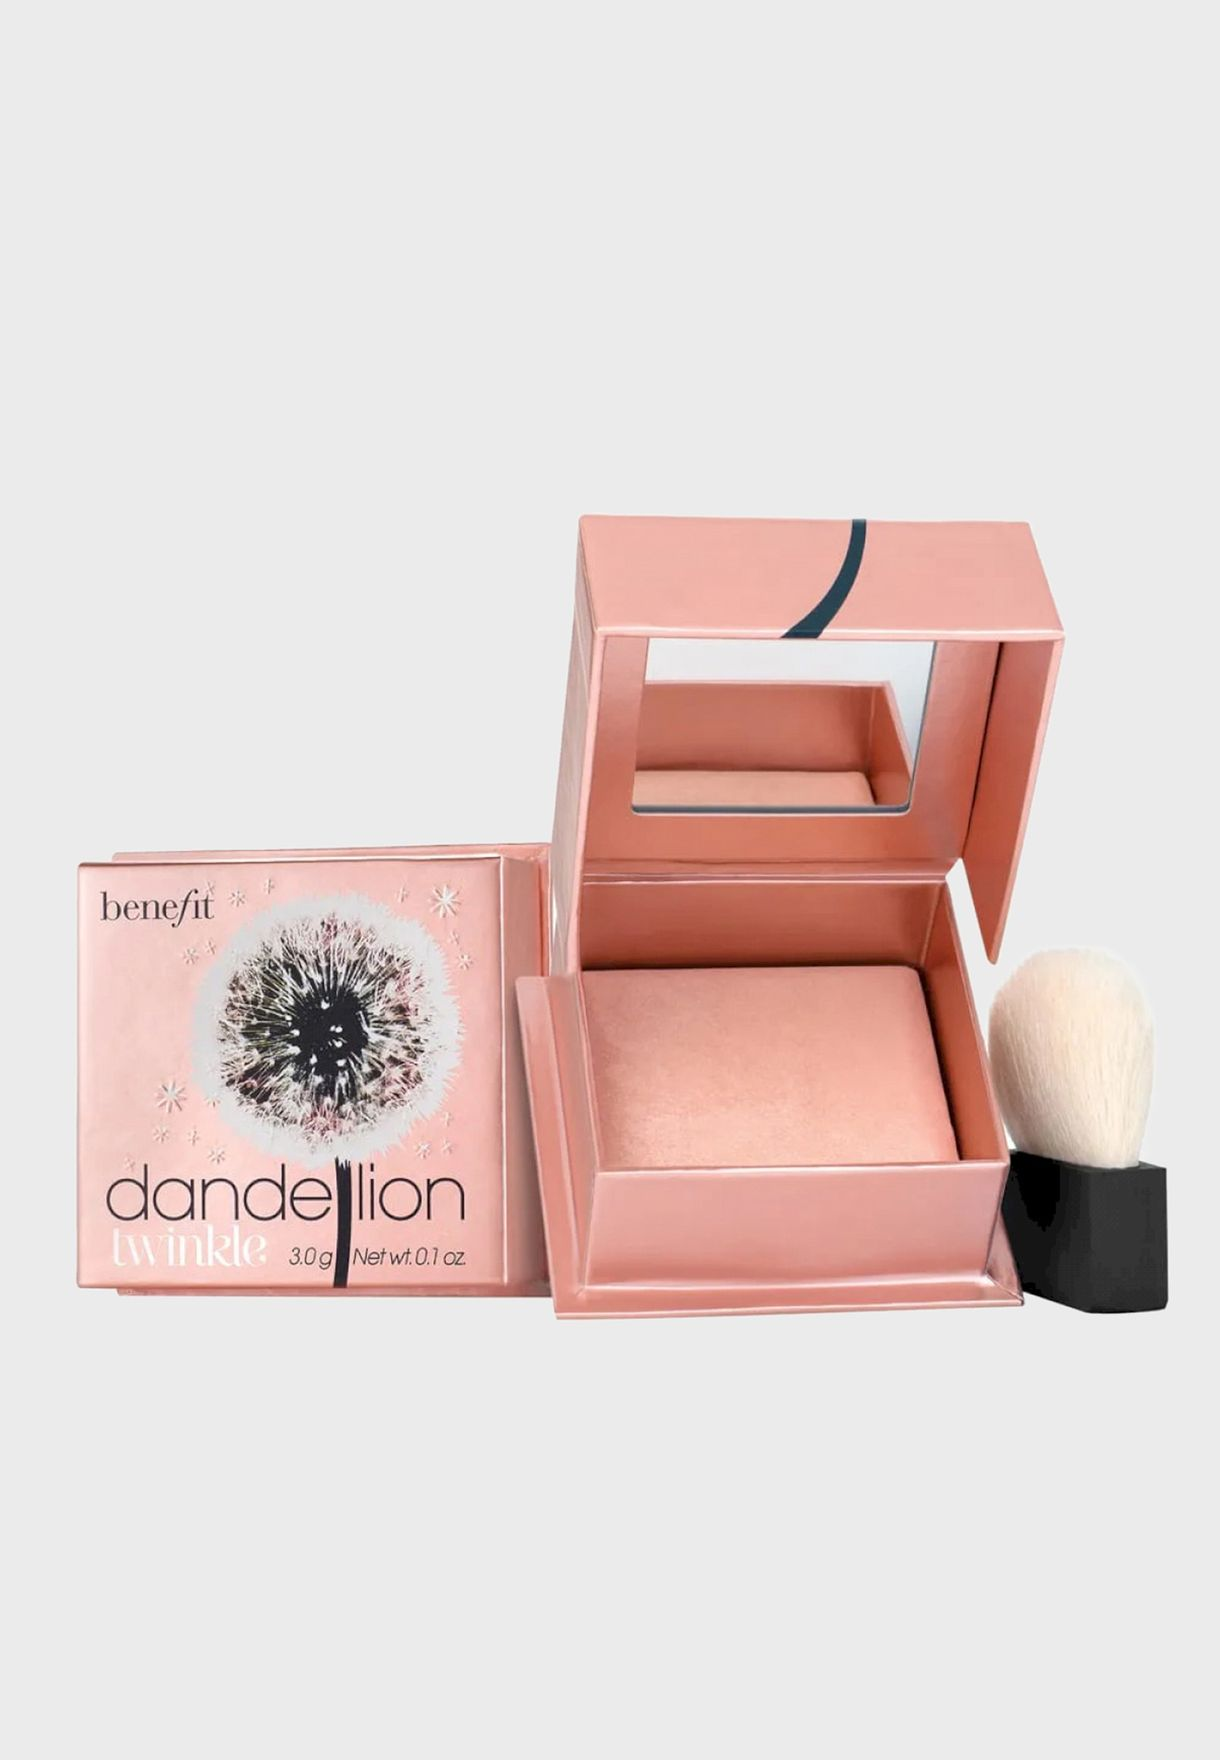 Dandelion Twinkle Mini Fm Blush Powder